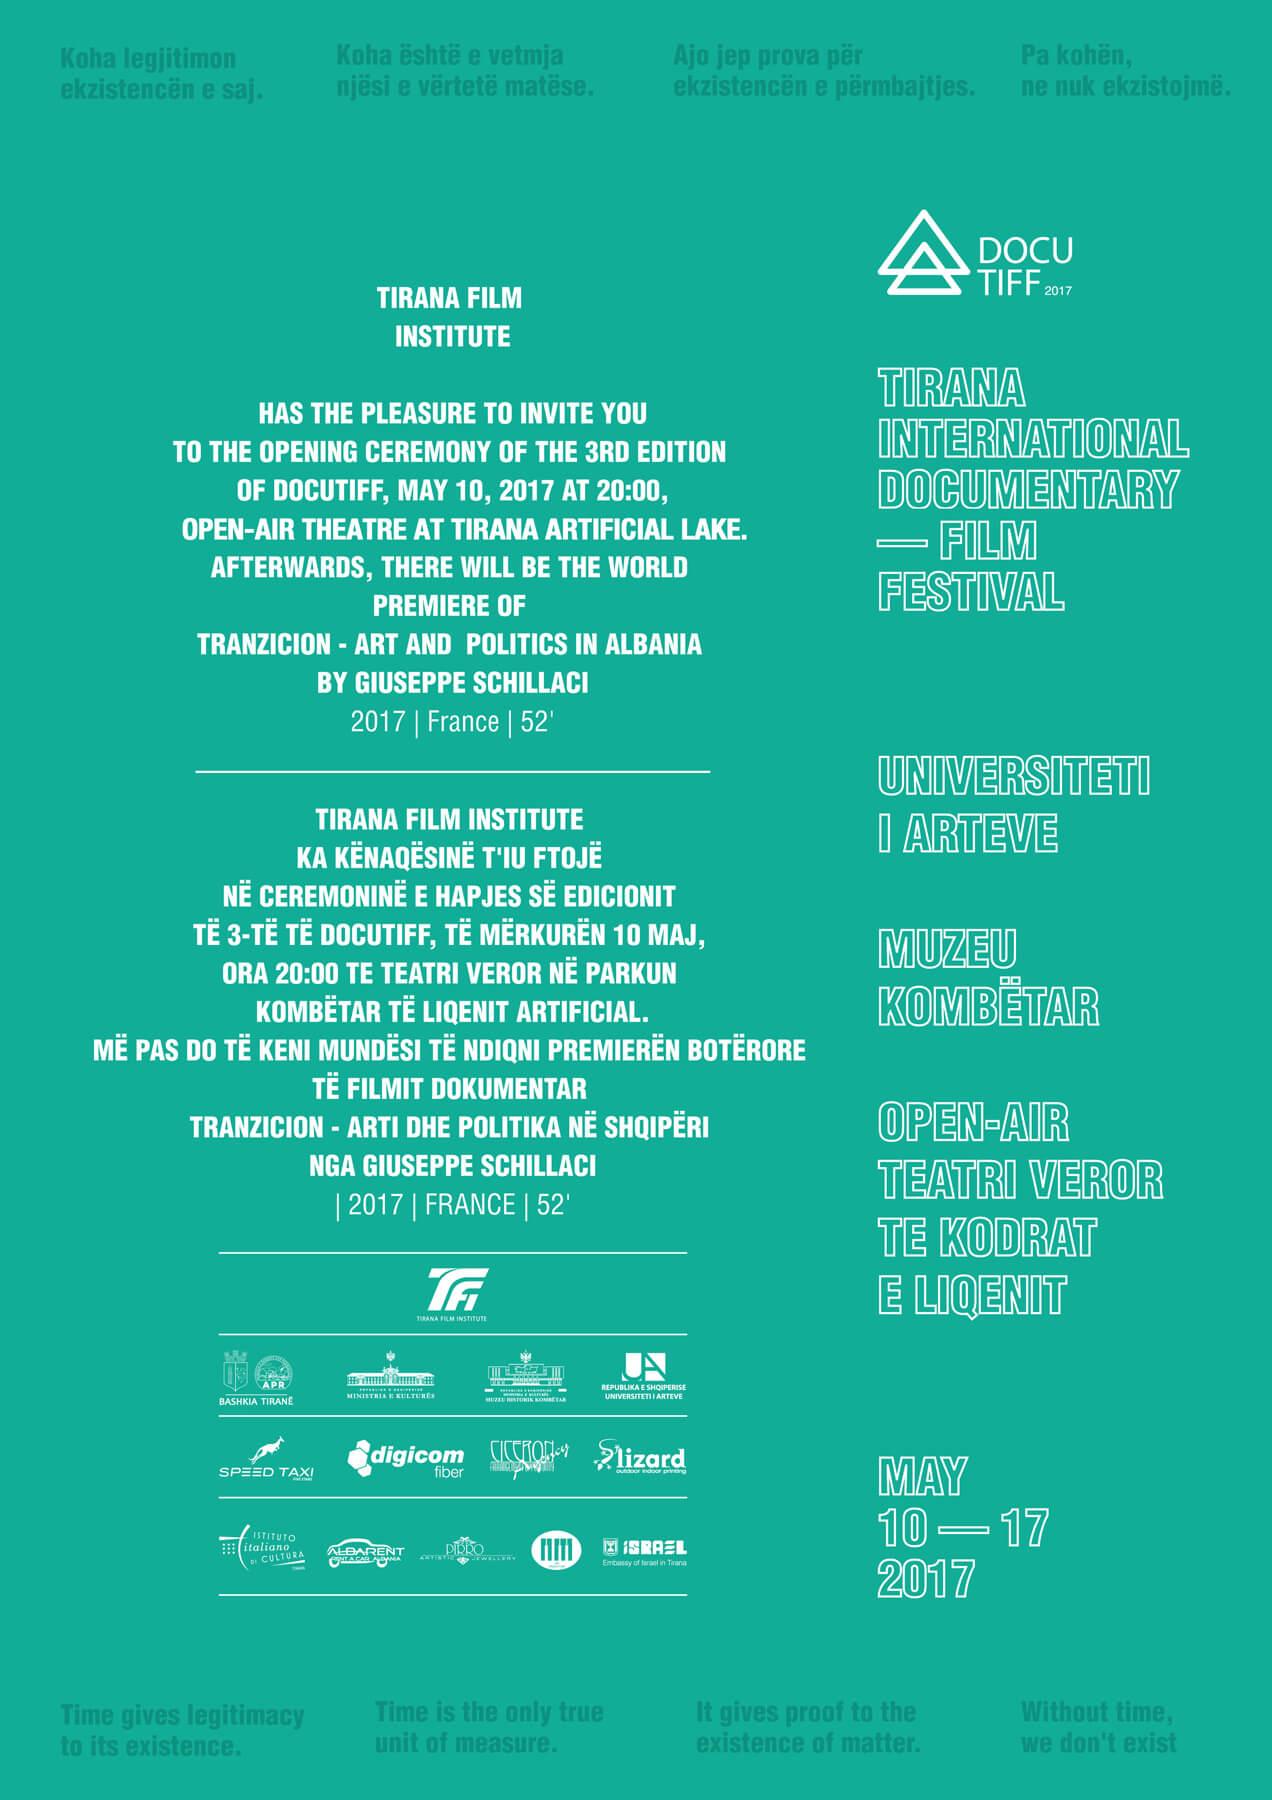 Ftesa-Elektronike-DocuTIFF-2017_shqip-eng